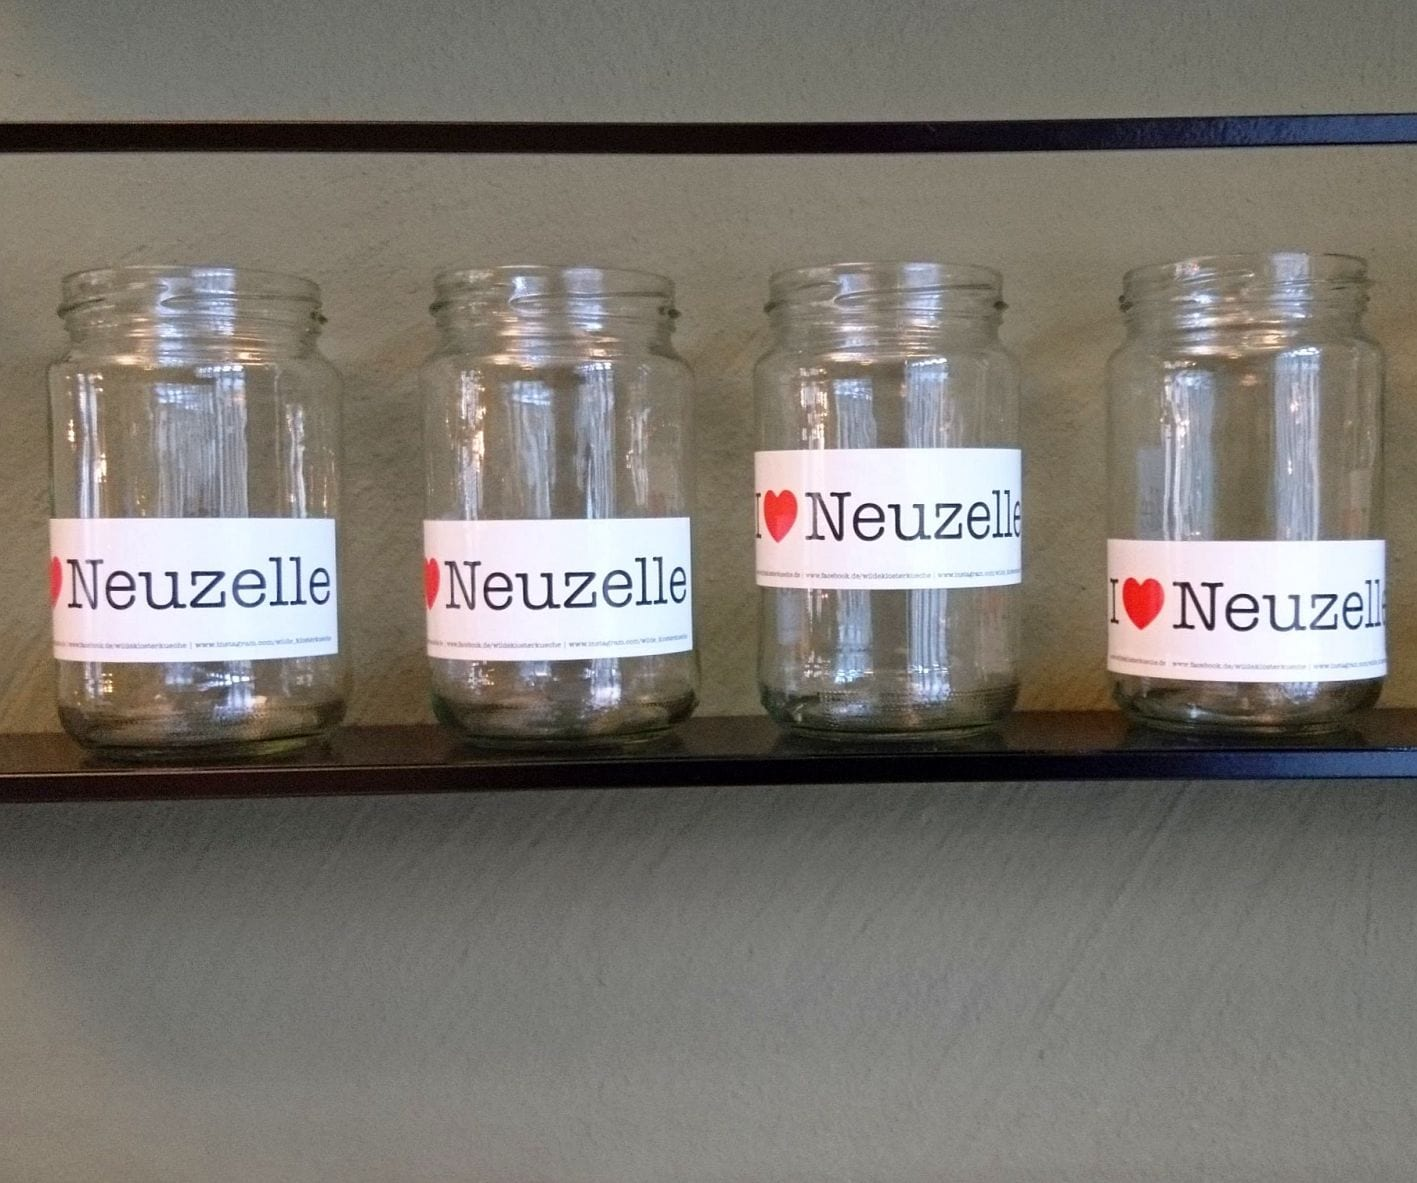 I love Neuzelle